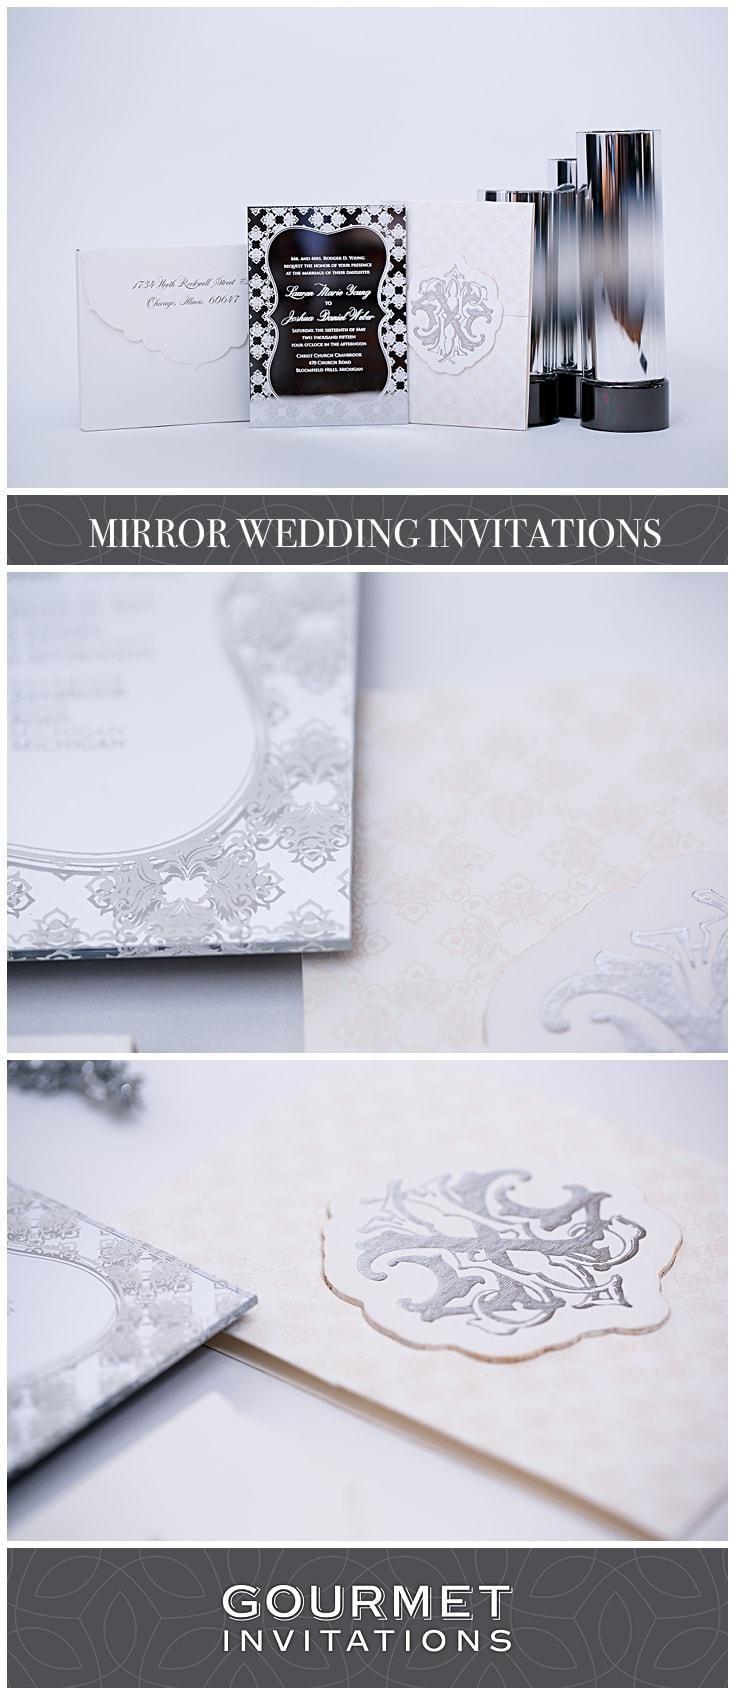 mirror-wedding-invitations_0000